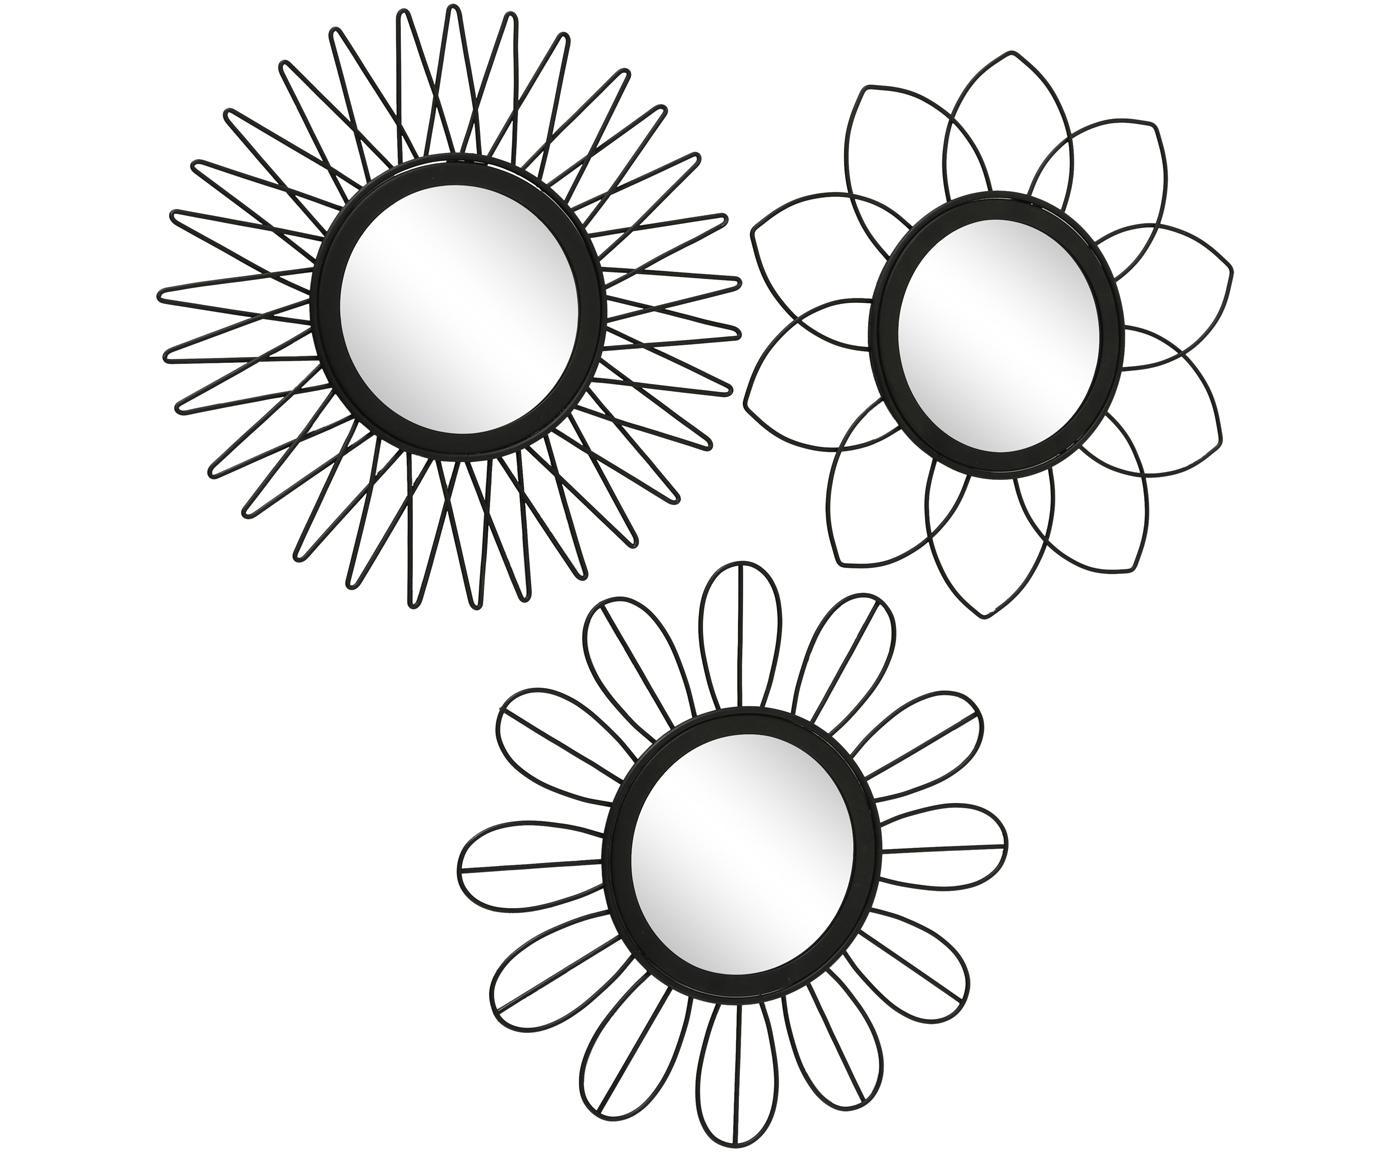 Ronde wandspiegelsset Naima, 3-delig, Metaal, spiegelglas, Zwart, Ø 27 cm